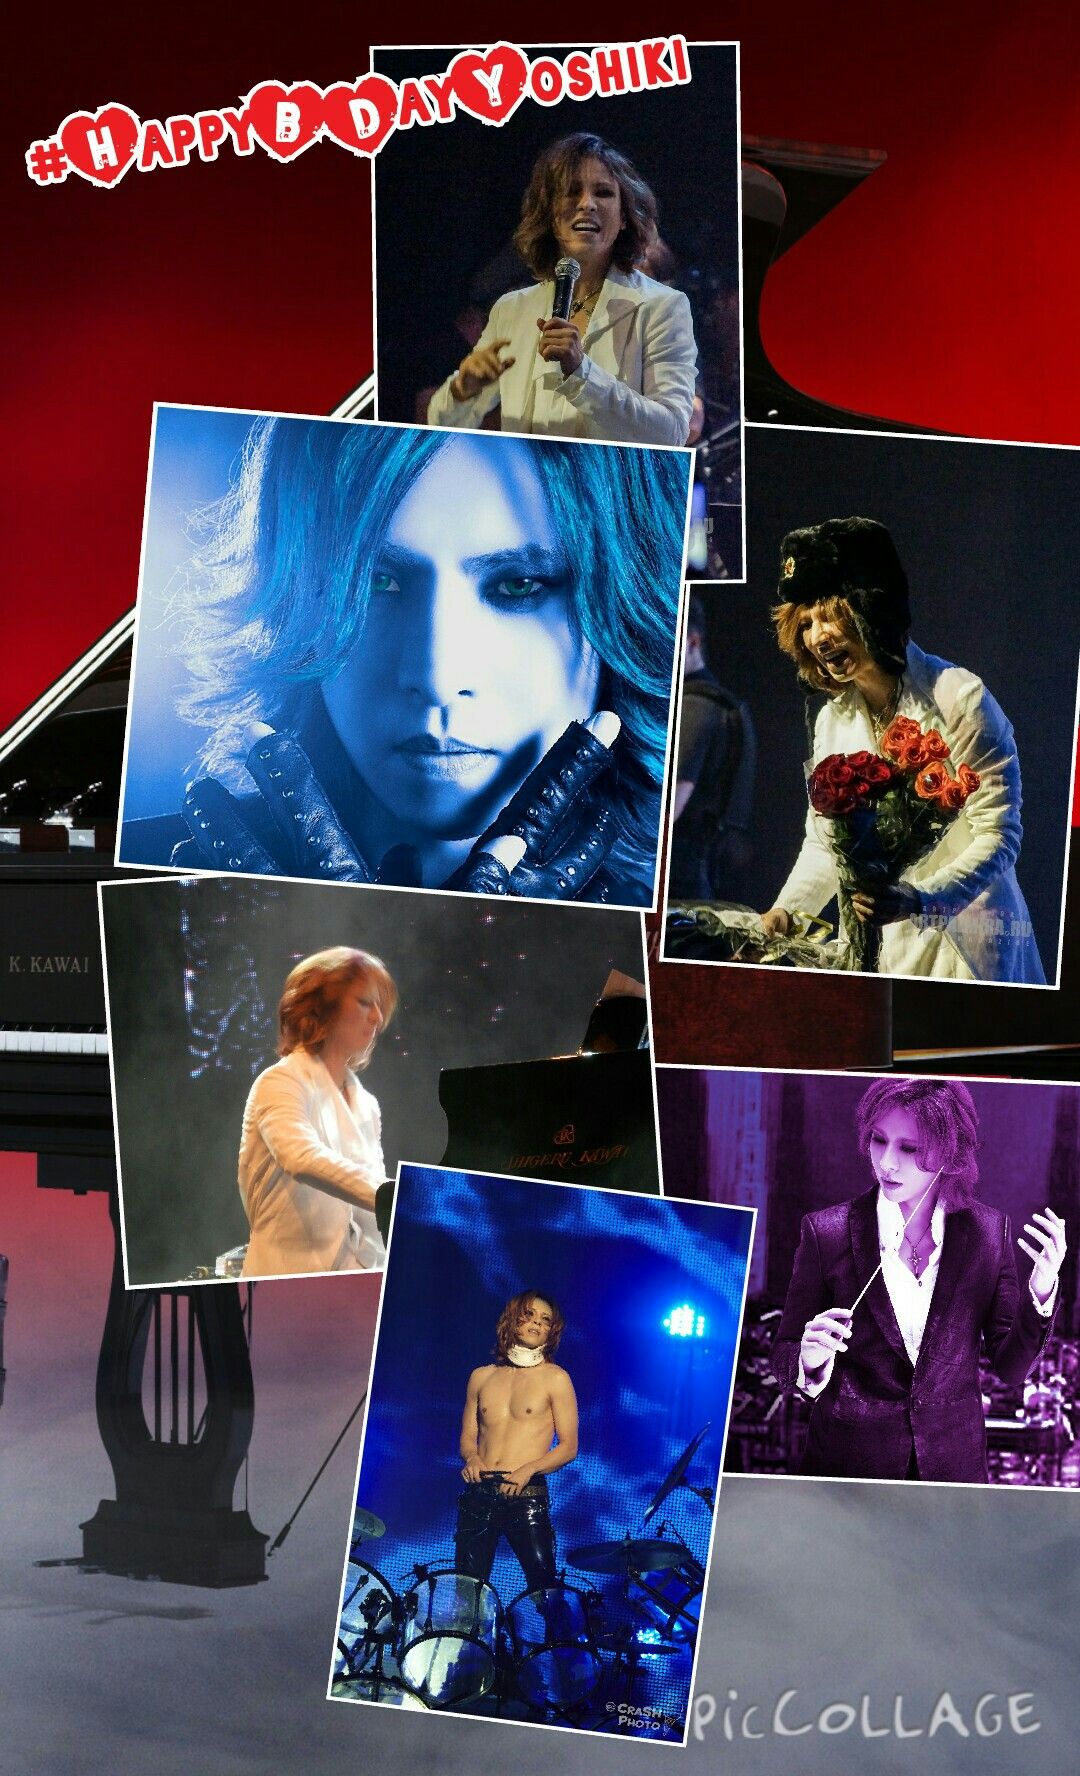 Collage 2014-11-20 10_39_07.jpg